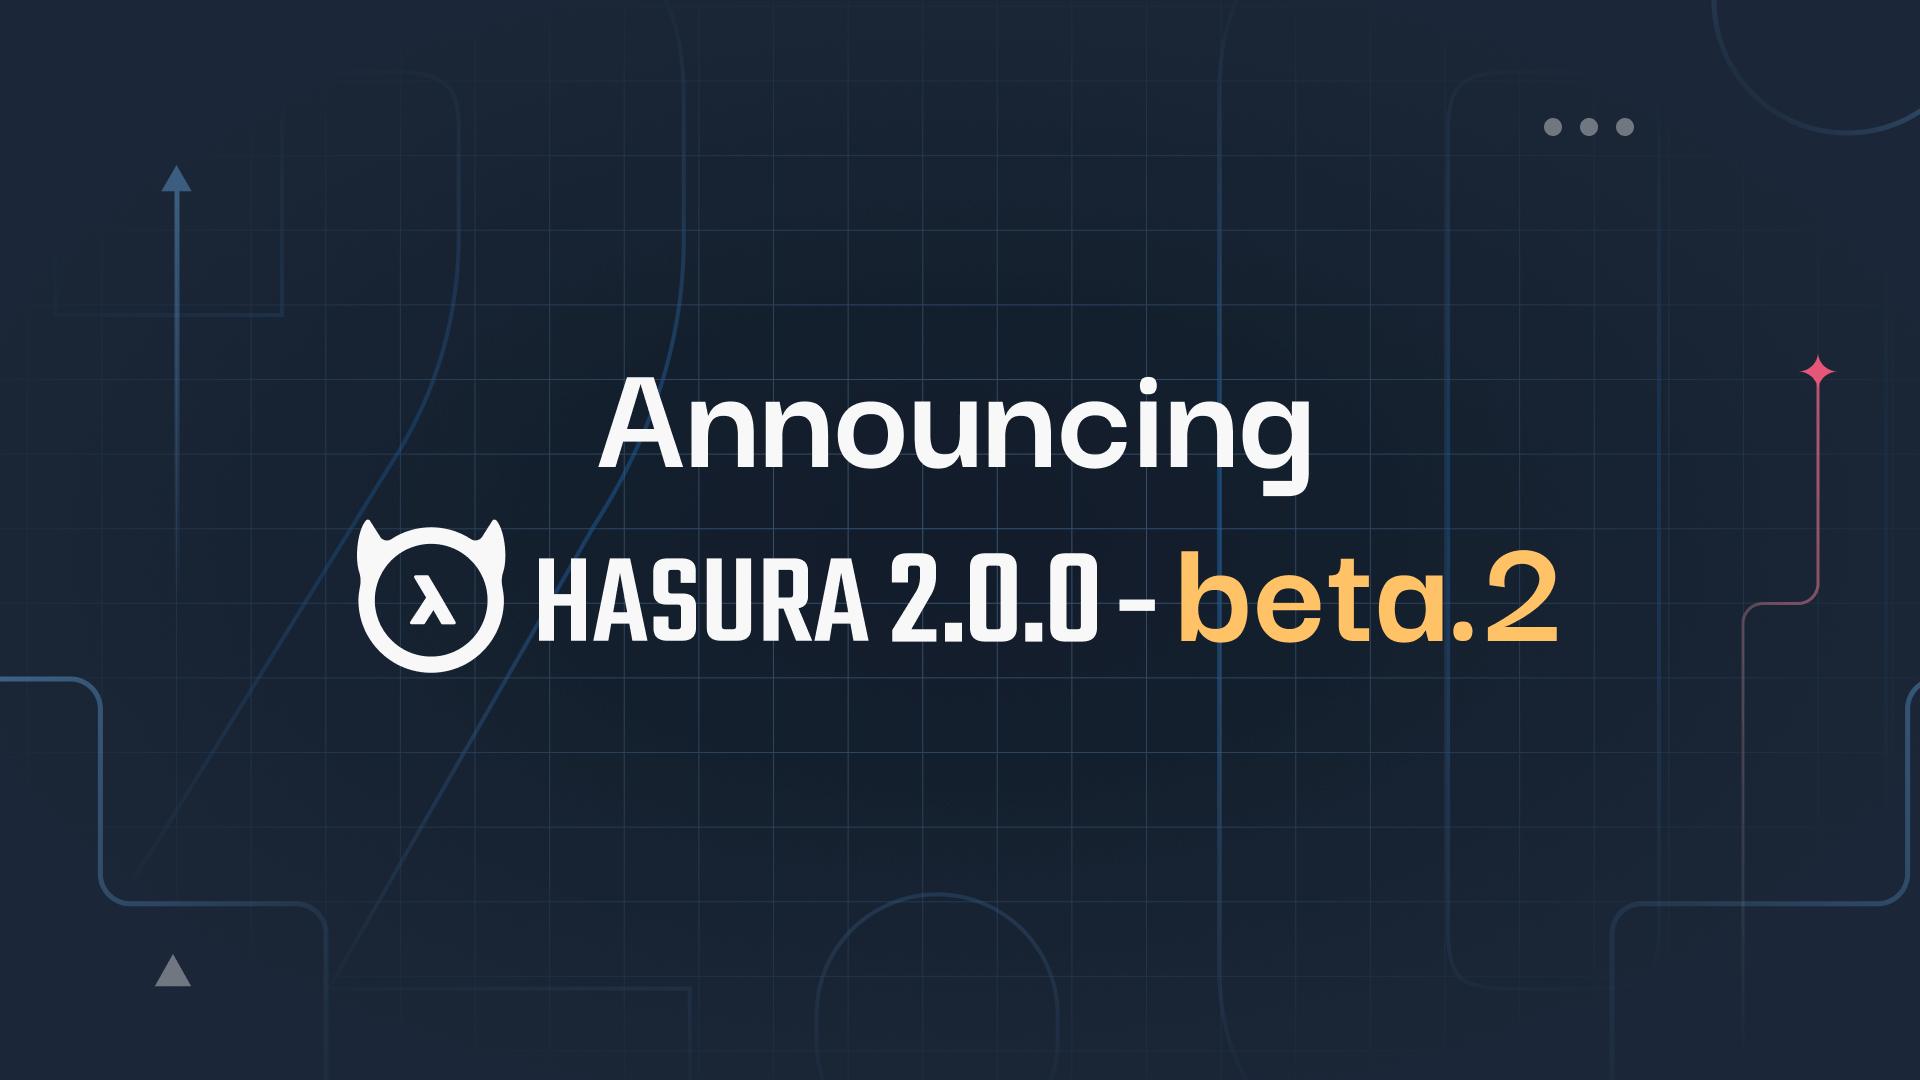 Announcing Hasura 2.0.0-beta.2